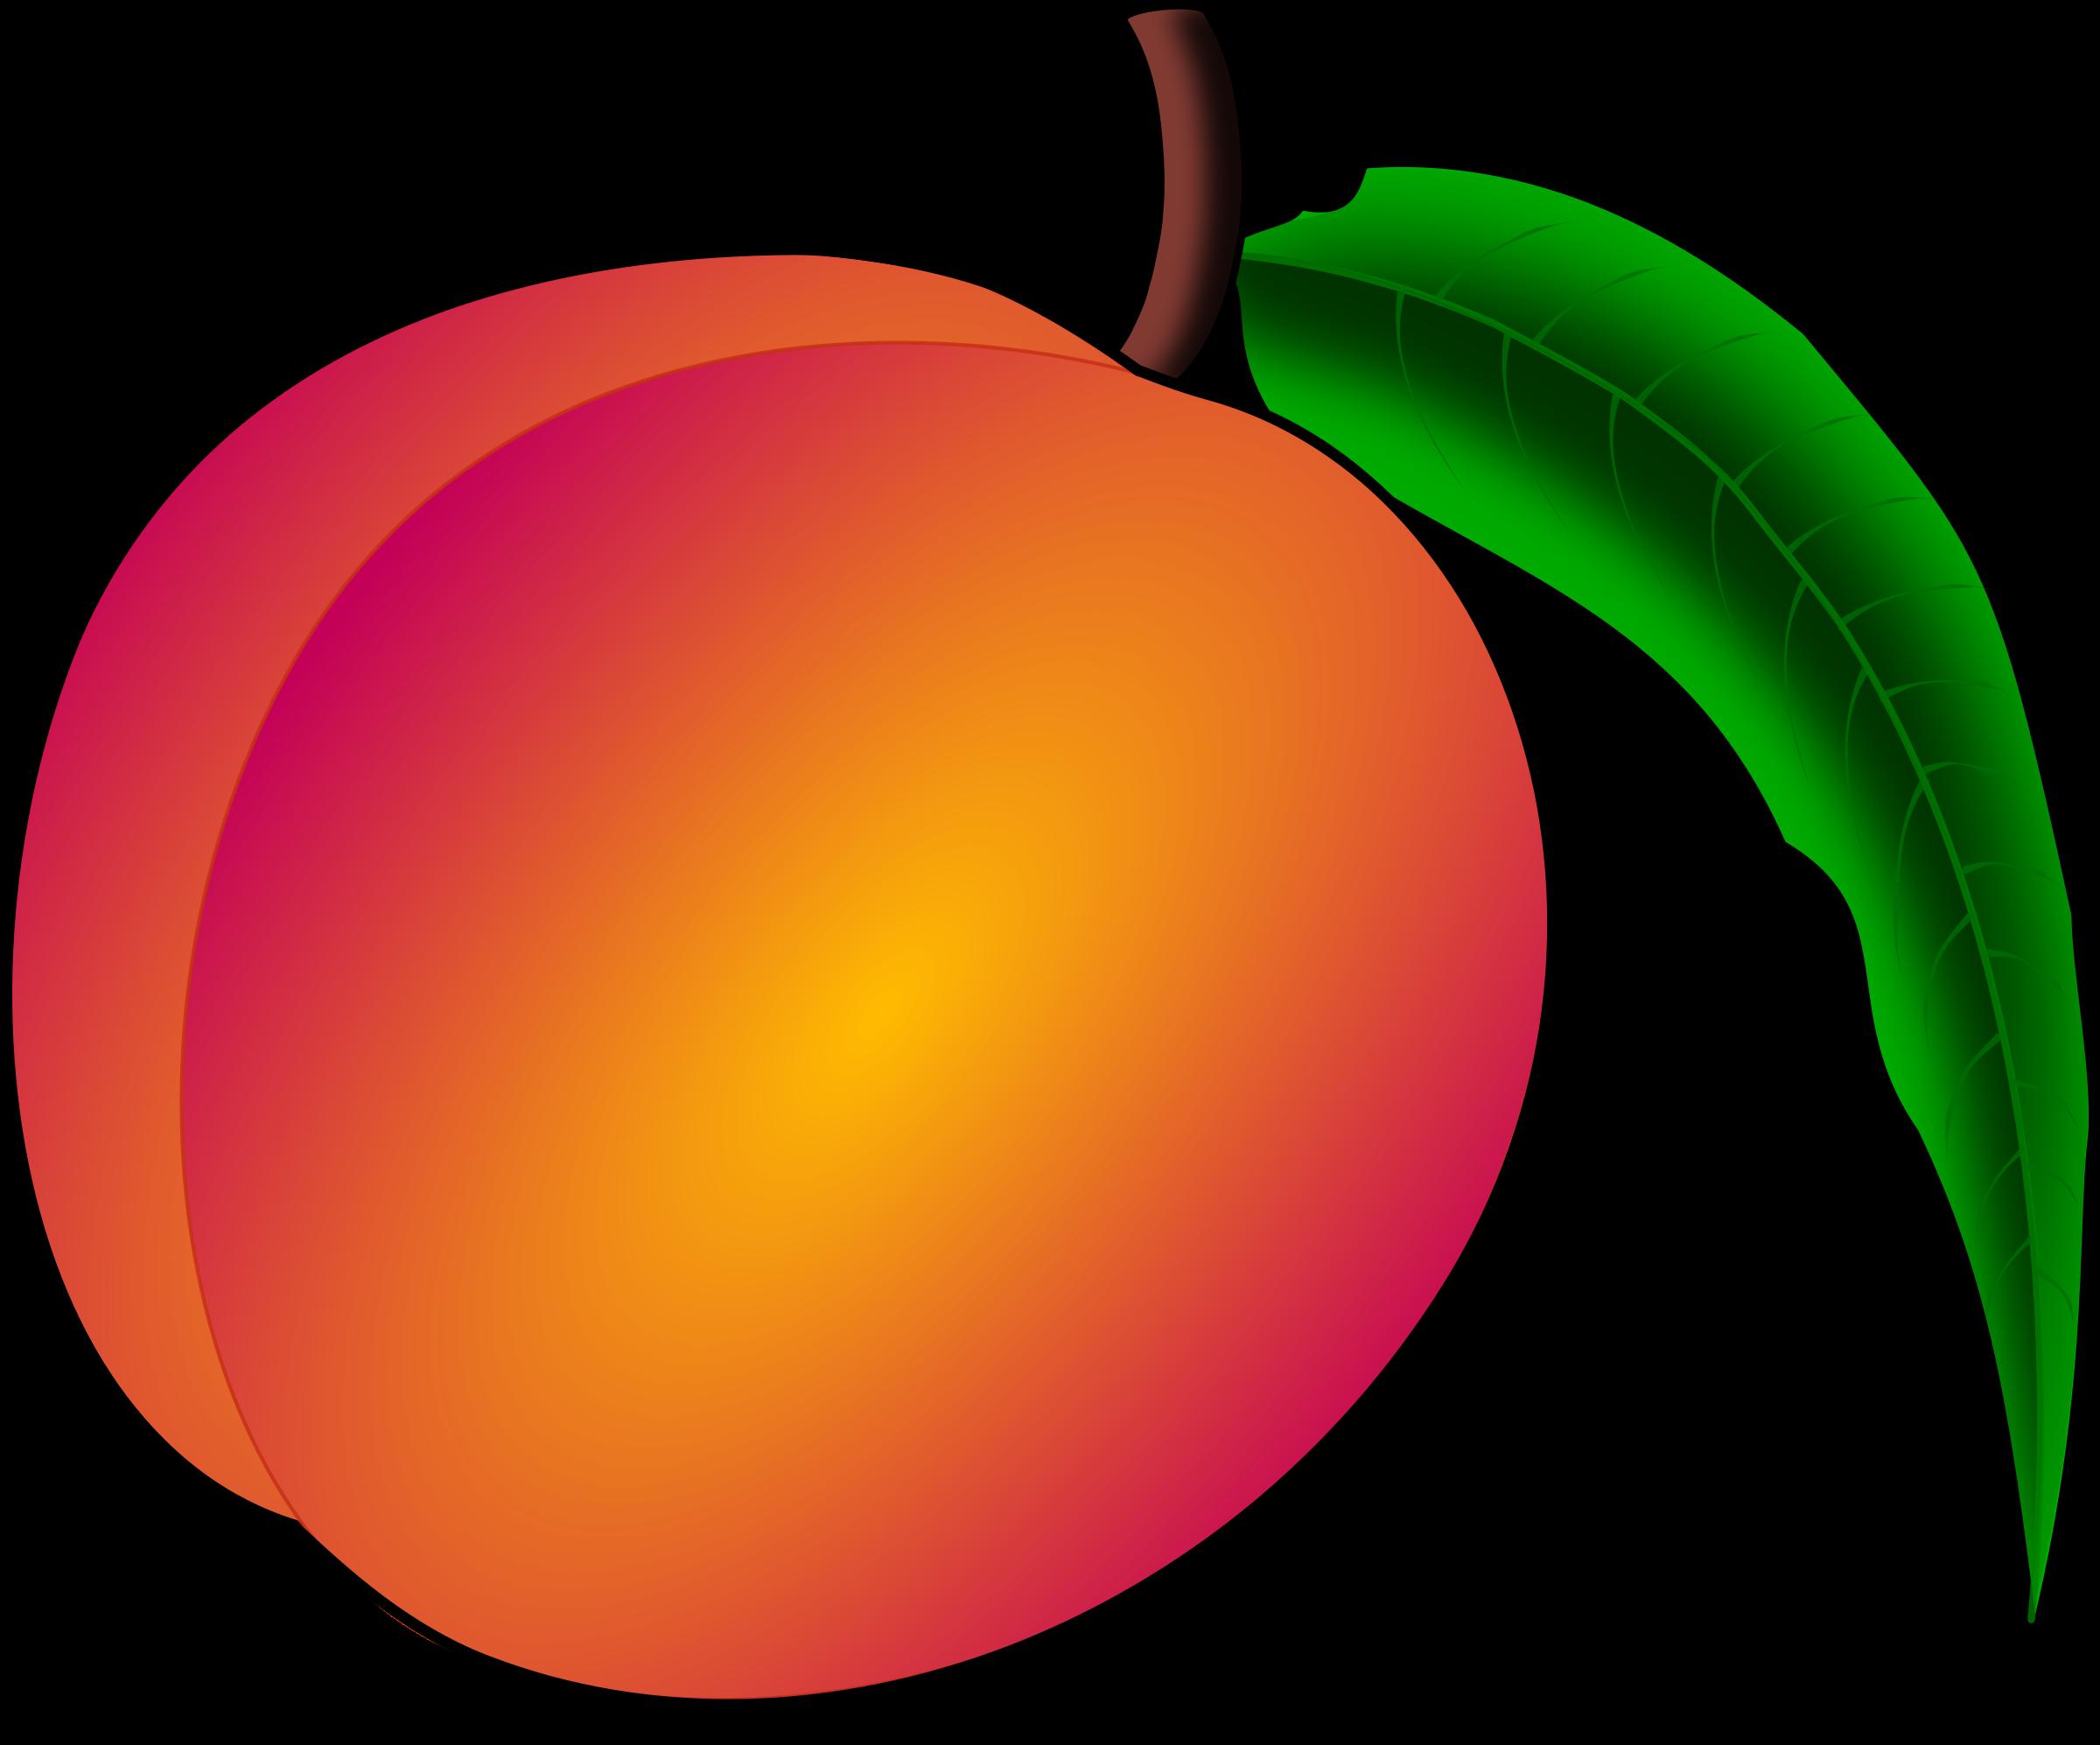 Free Peaches Cliparts, Download Free Clip Art, Free Clip Art.